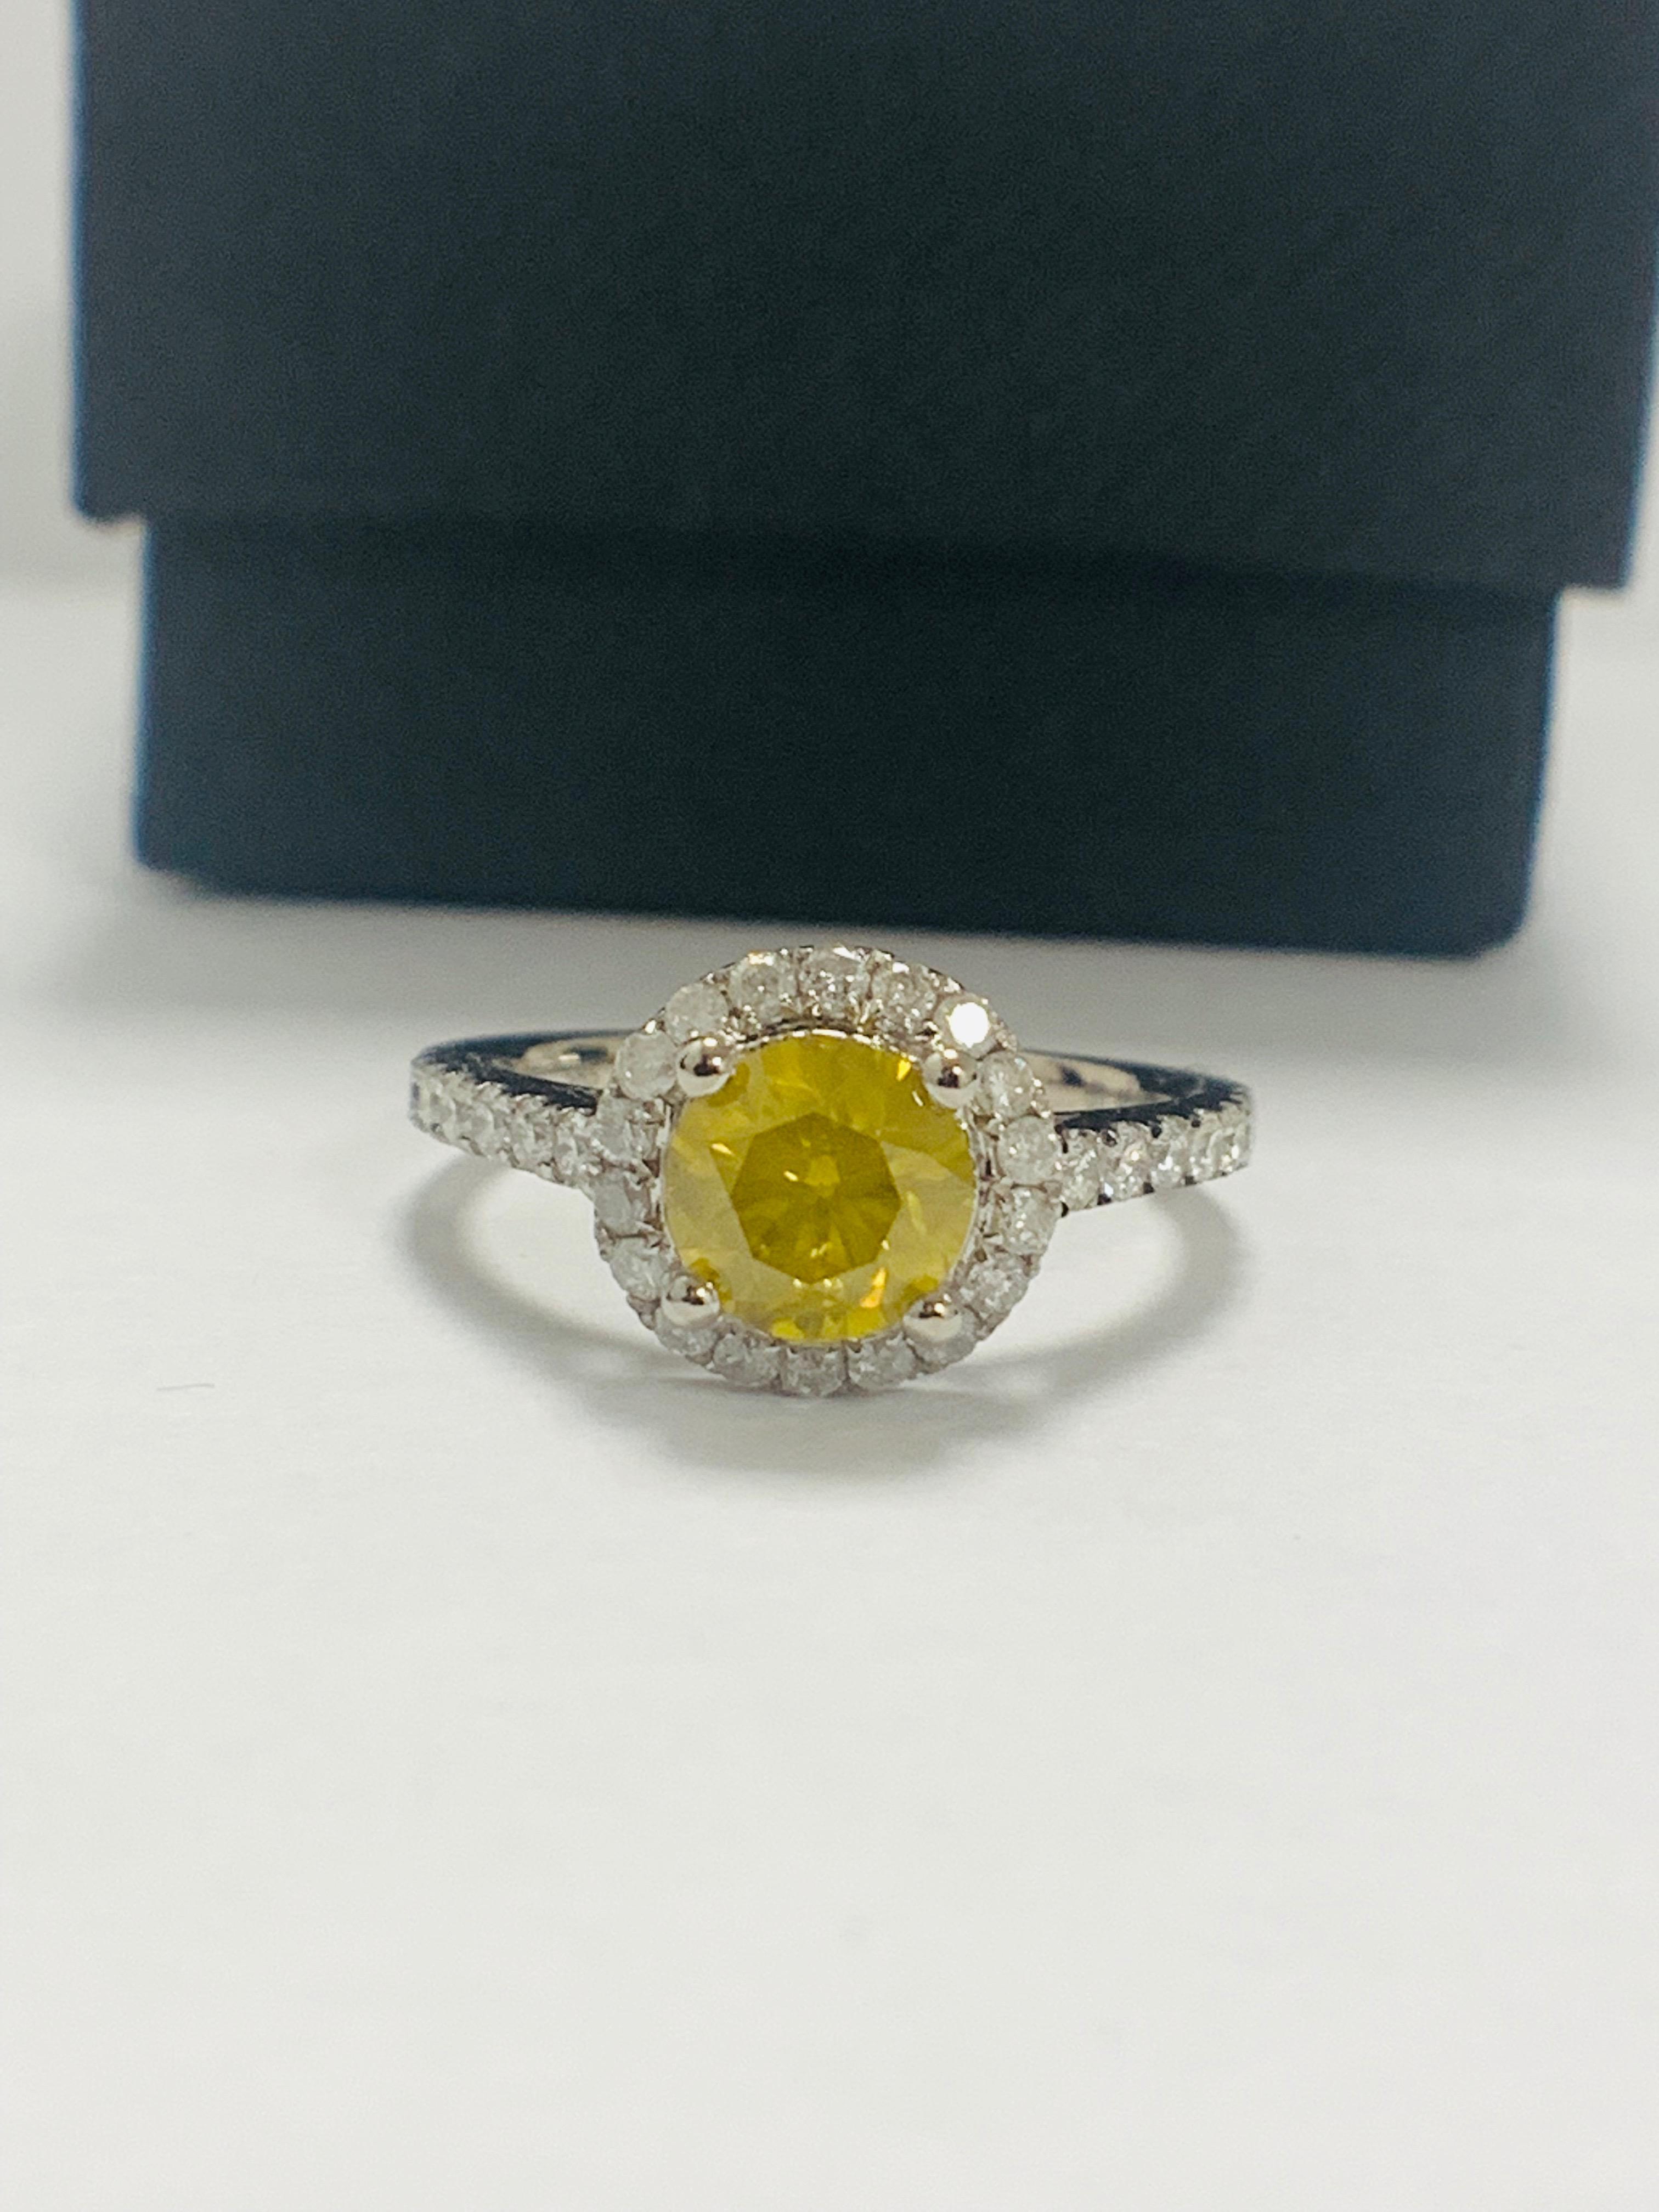 14ct White Gold Diamond ring featuring centre, round brilliant cut, yellow Diamond (1.08ct)